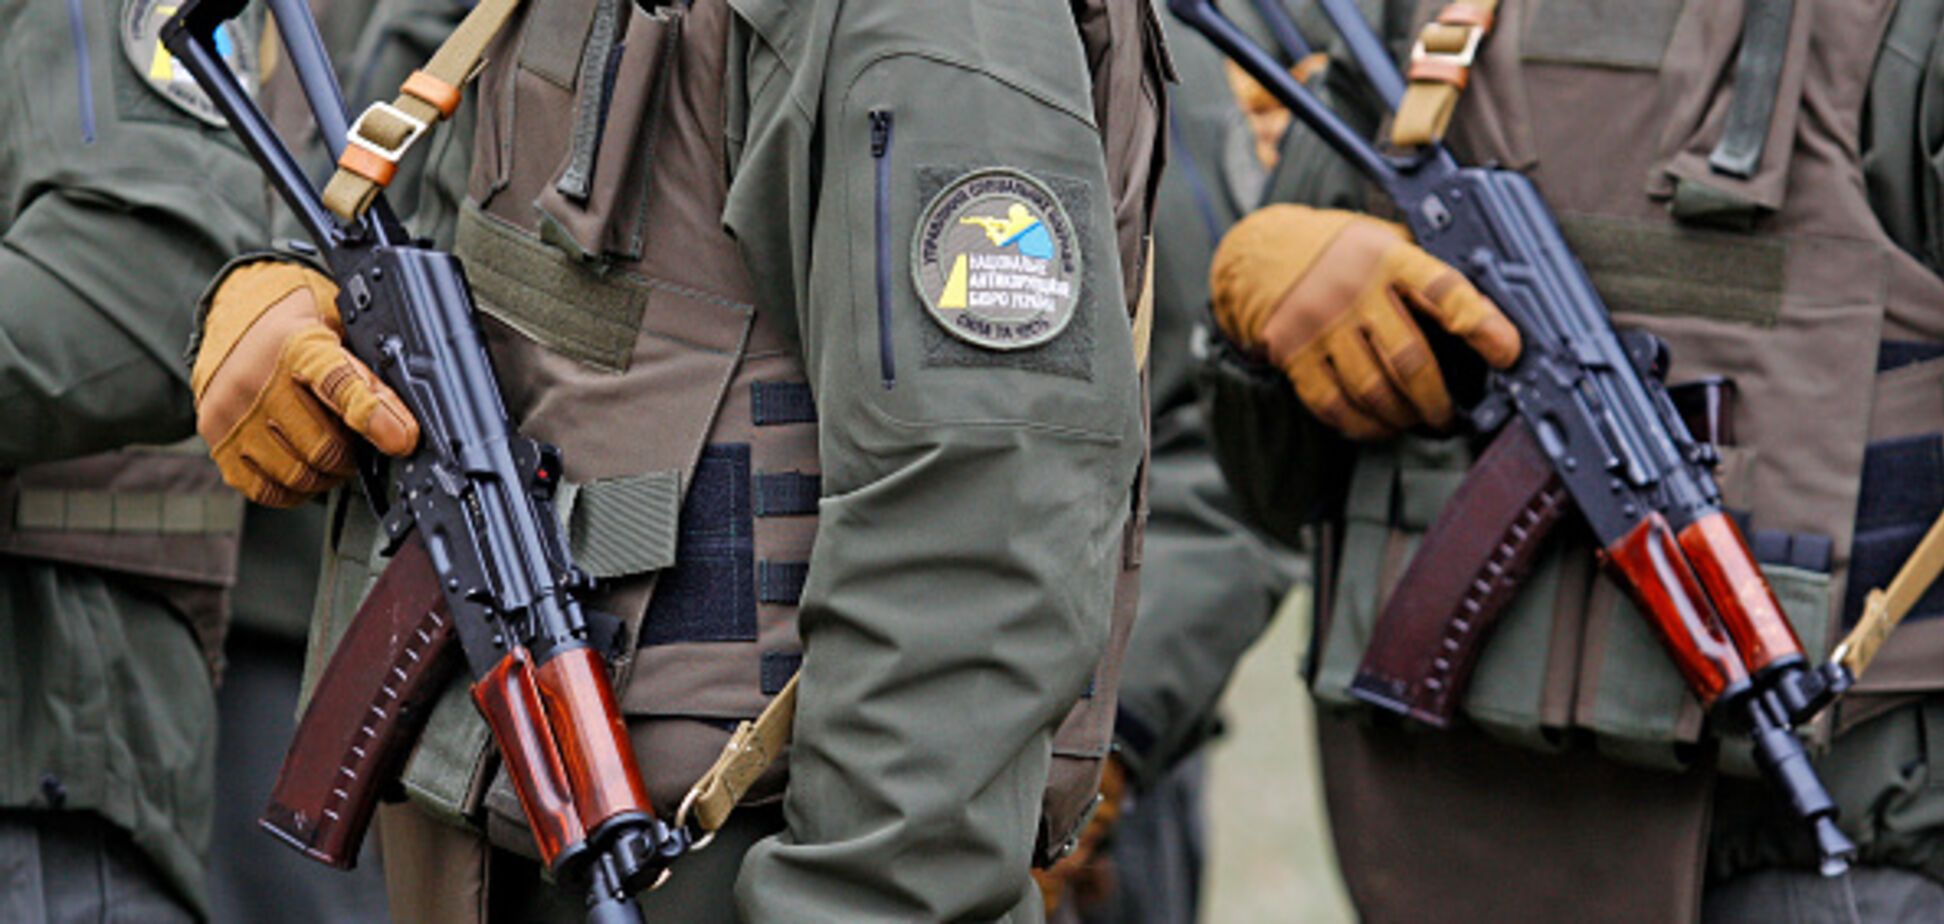 ГПУ завела дело на сотрудников НАБУ за обыски в Минюсте